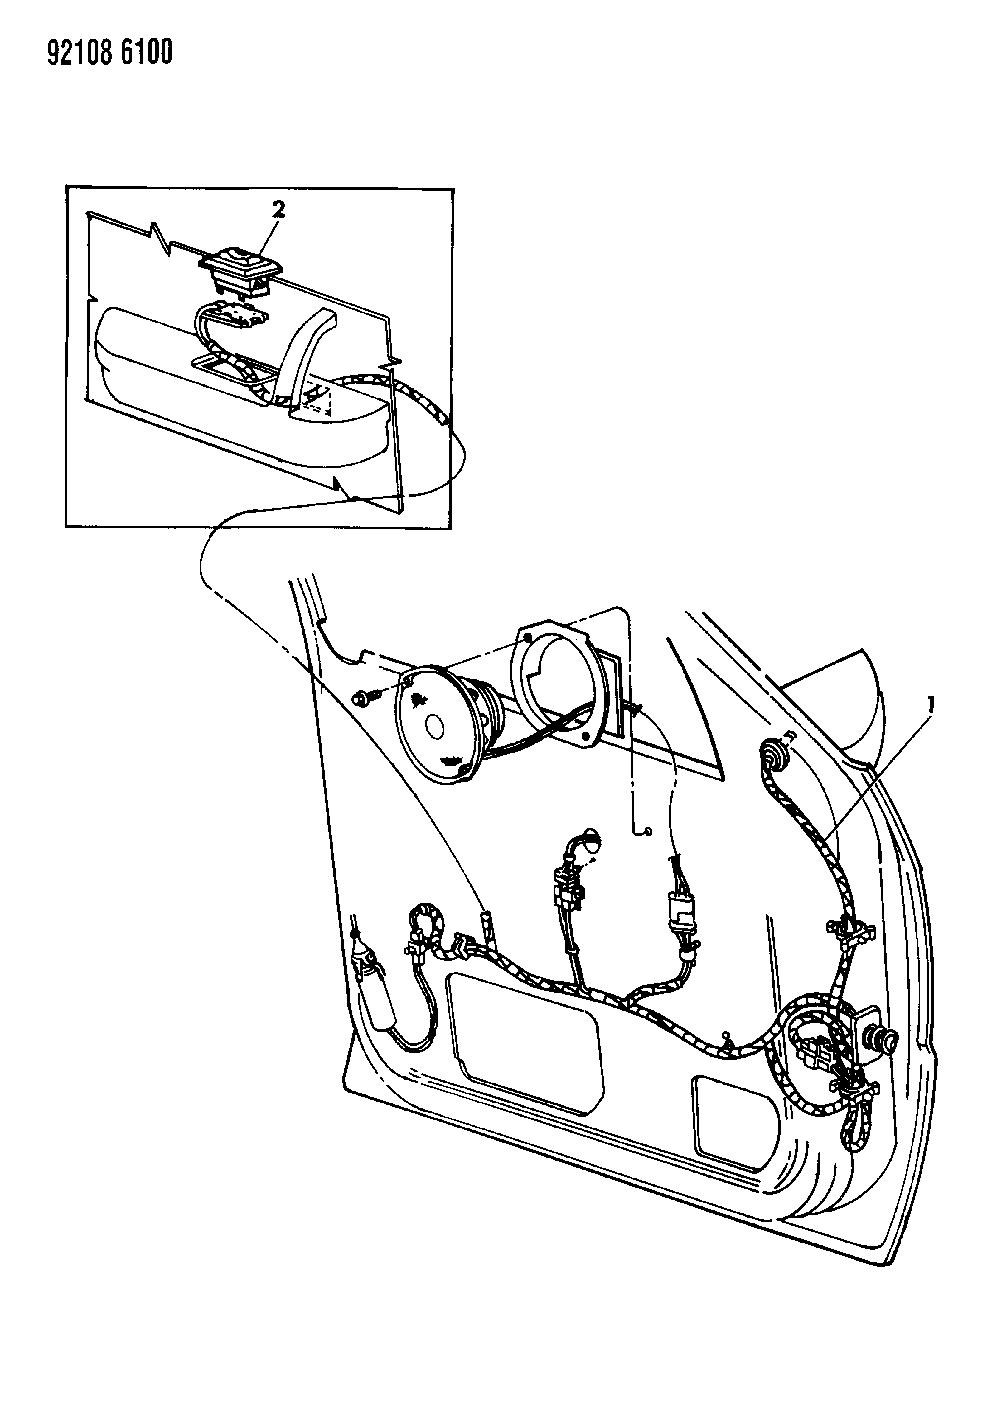 1992 Dodge Shadow Wiring Diagram